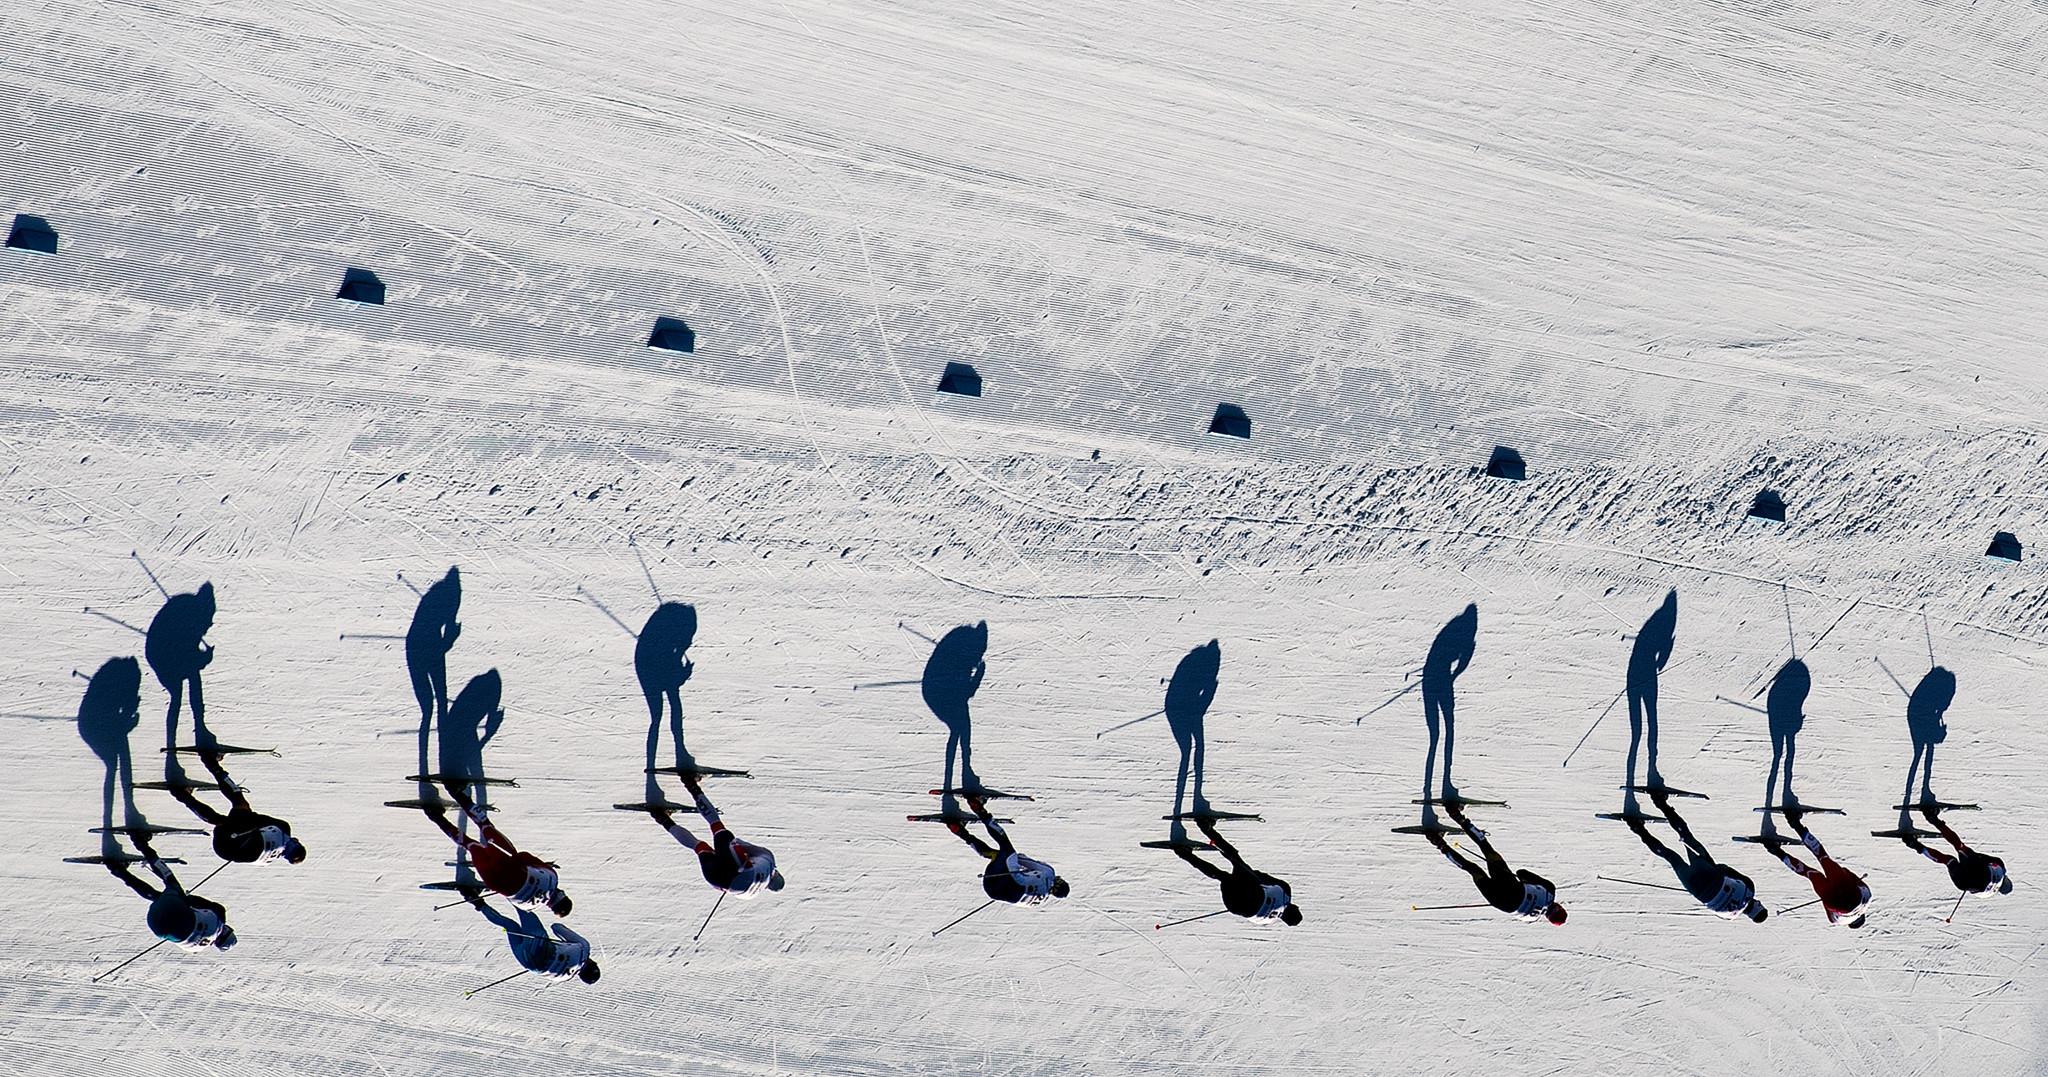 Stora Enso to sponsor 2019 FIS Nordic World Ski Championships